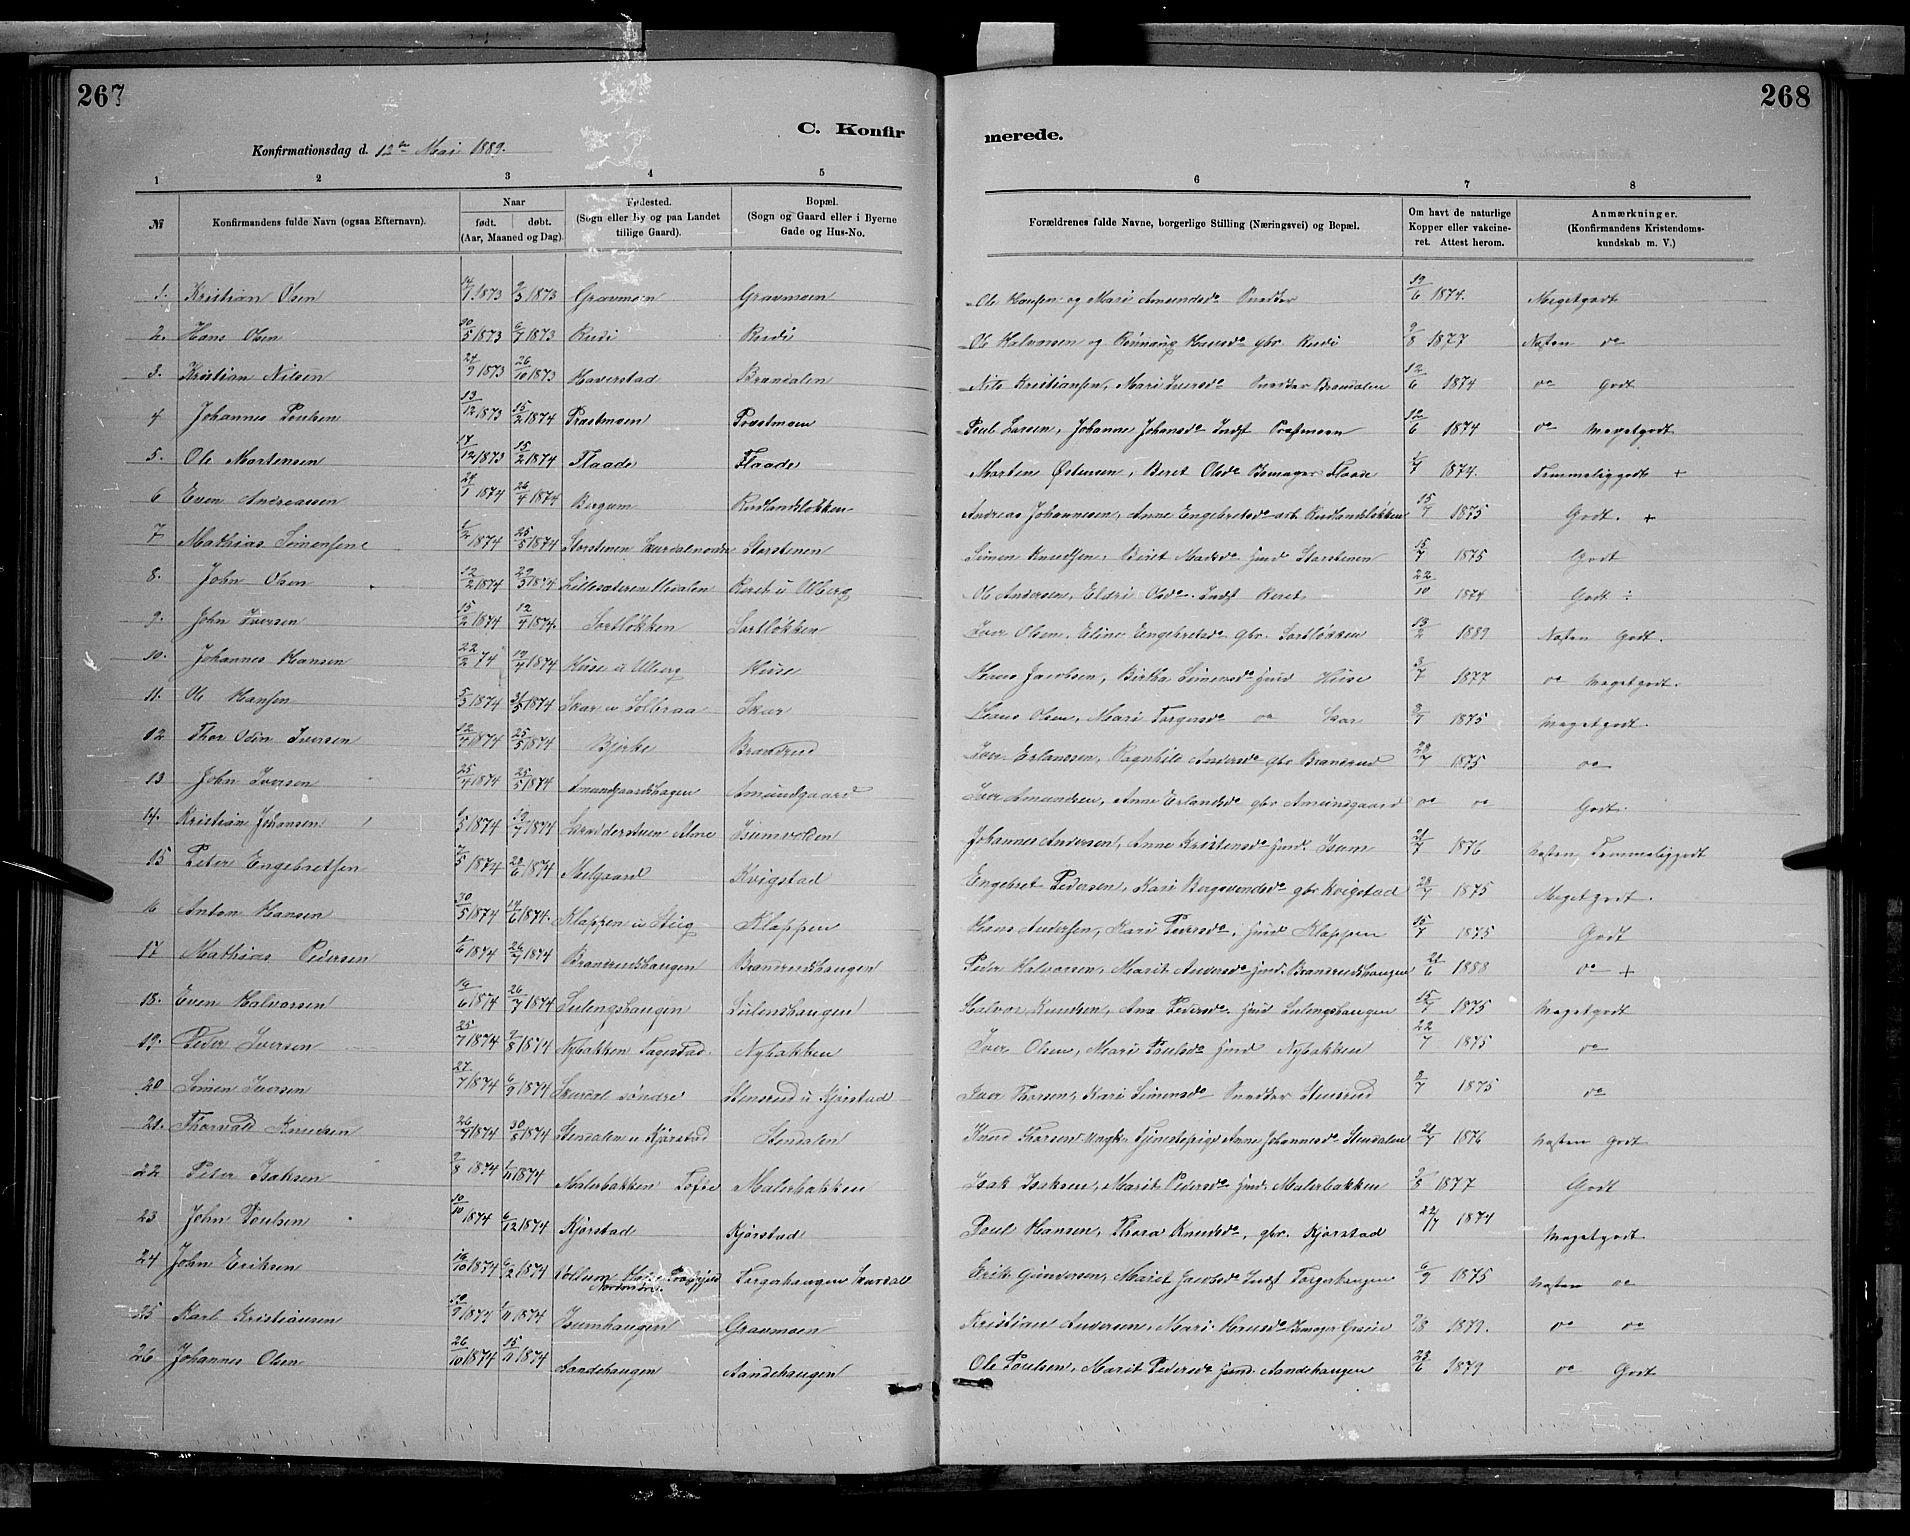 SAH, Sør-Fron prestekontor, H/Ha/Hab/L0003: Klokkerbok nr. 3, 1884-1896, s. 267-268